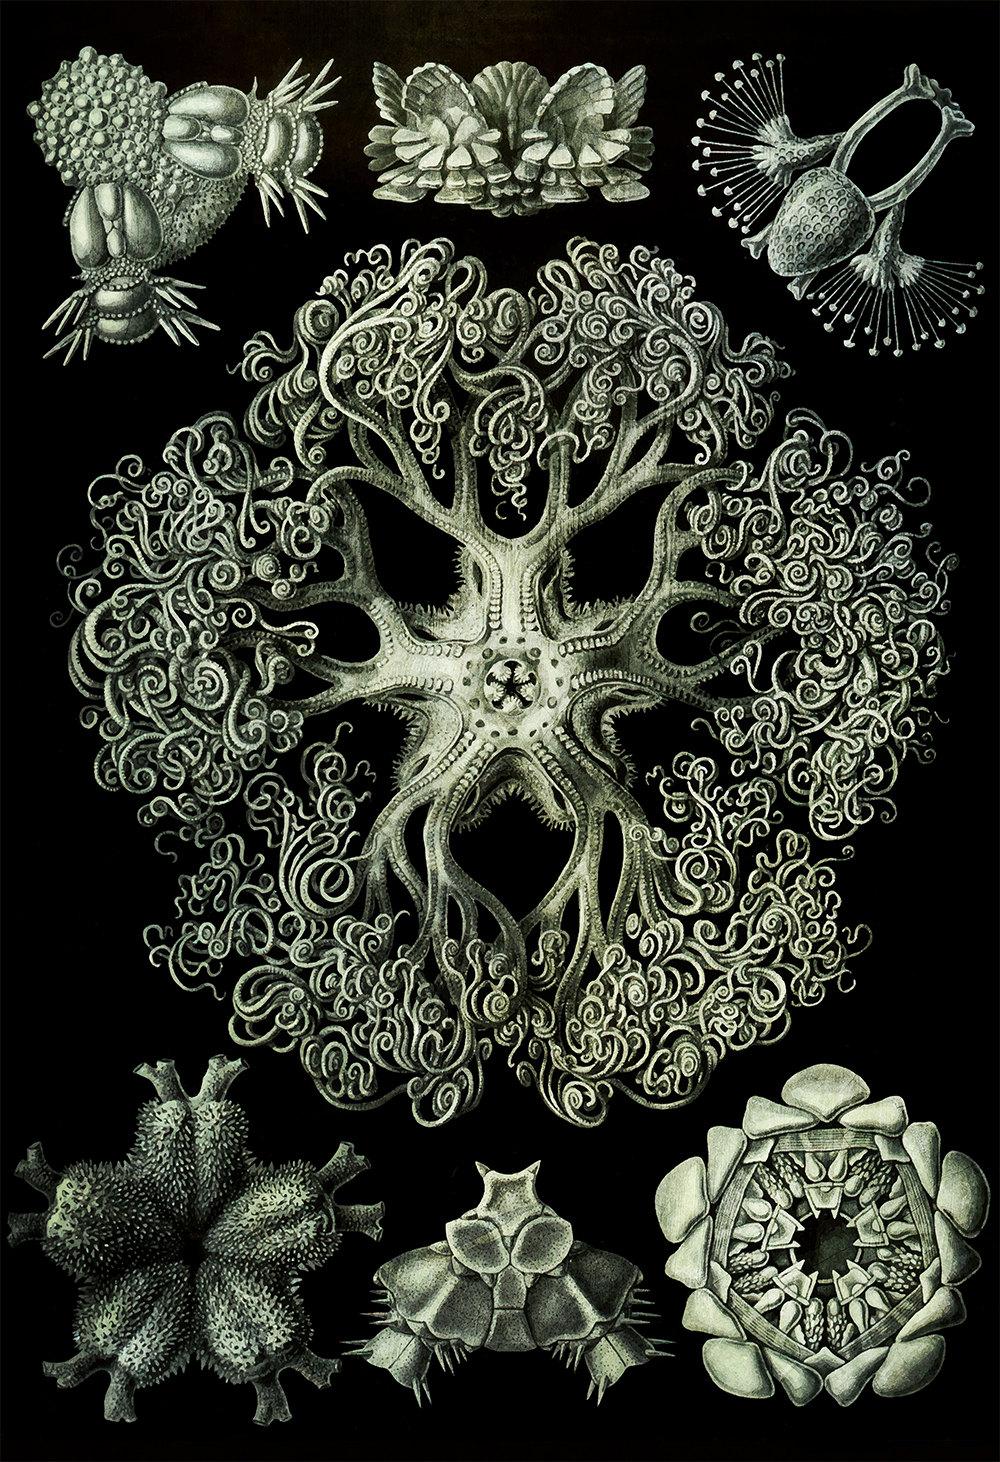 ernst-haeckel-ophiodea-print-marine-invertebrate-art-vintage-nautical-decor-ocean-wall-art-giclee-print-on-canvas-satin-5817b2ba4.jpg